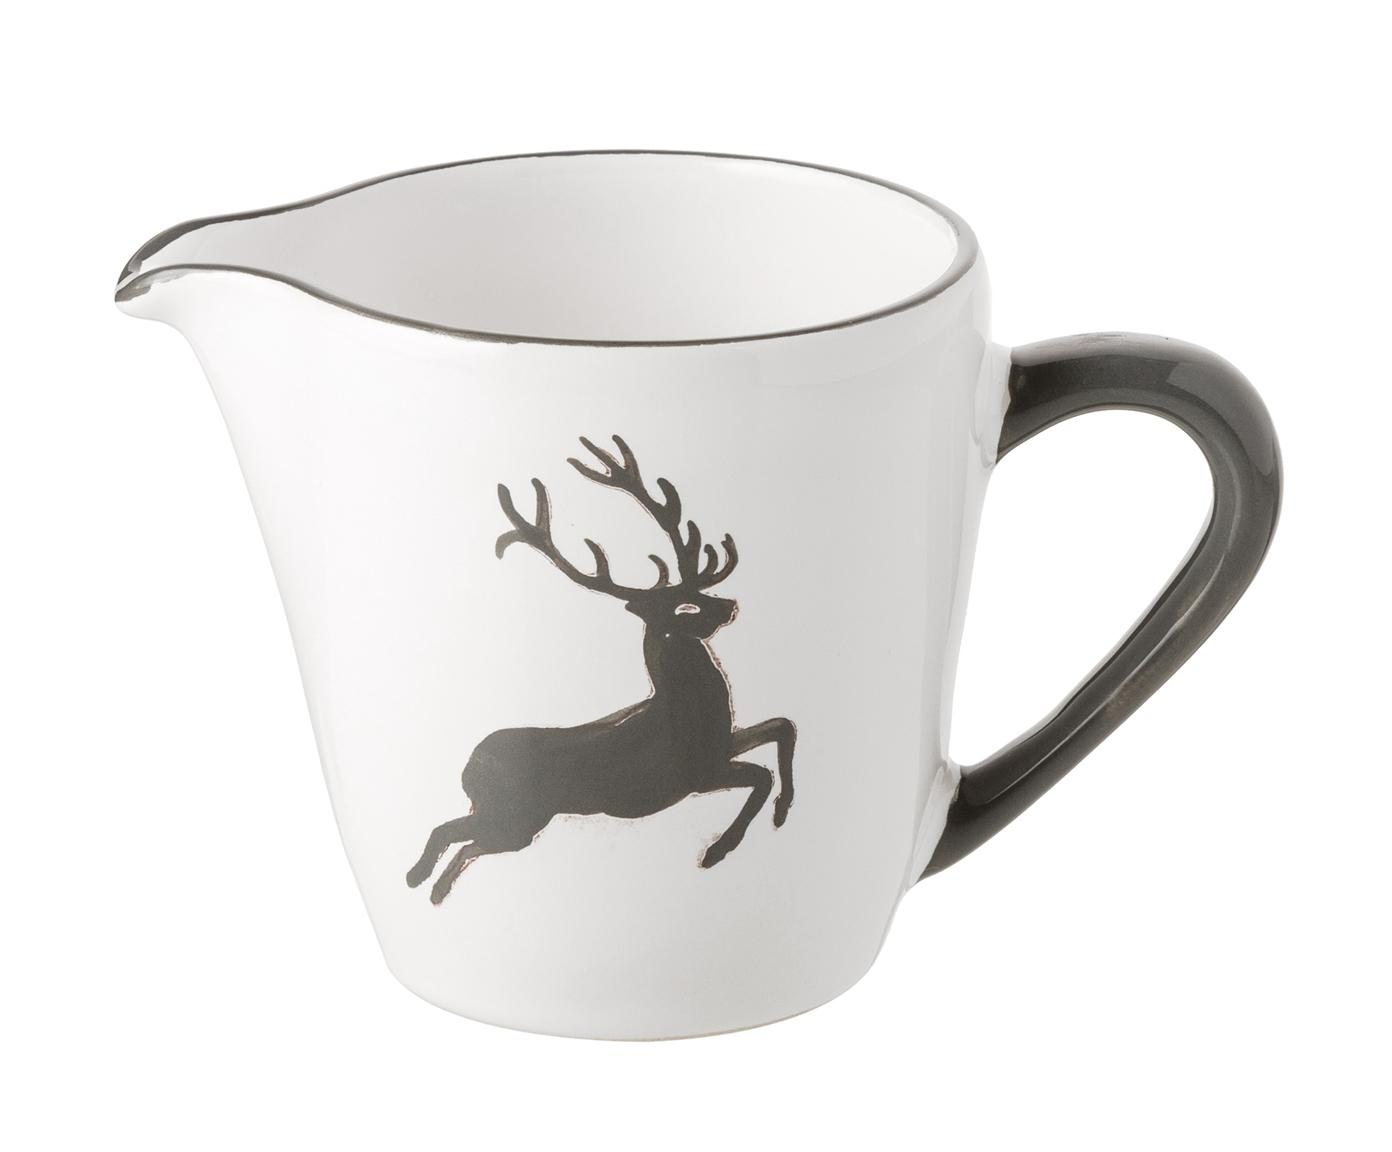 Dzbanek do mleka Grauer Hirsch, Ceramika, Szary, biały, 200 ml